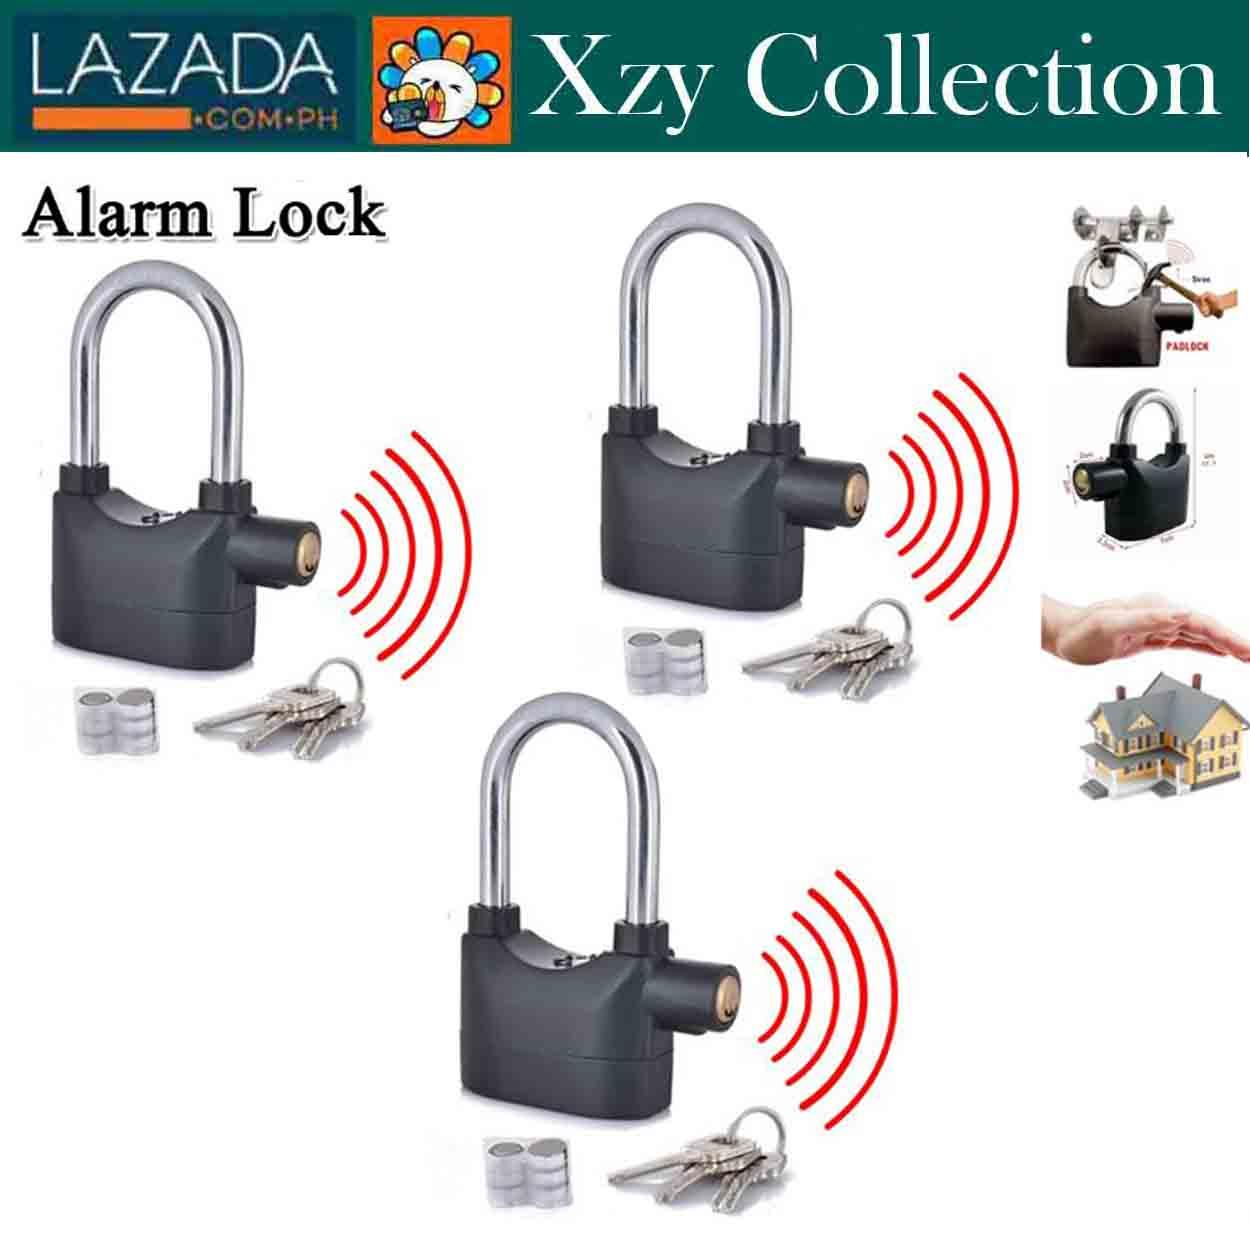 Set Of 3 New HST 110db Siren Alarm Lock Security Anti-Theft Padlock Door Motor